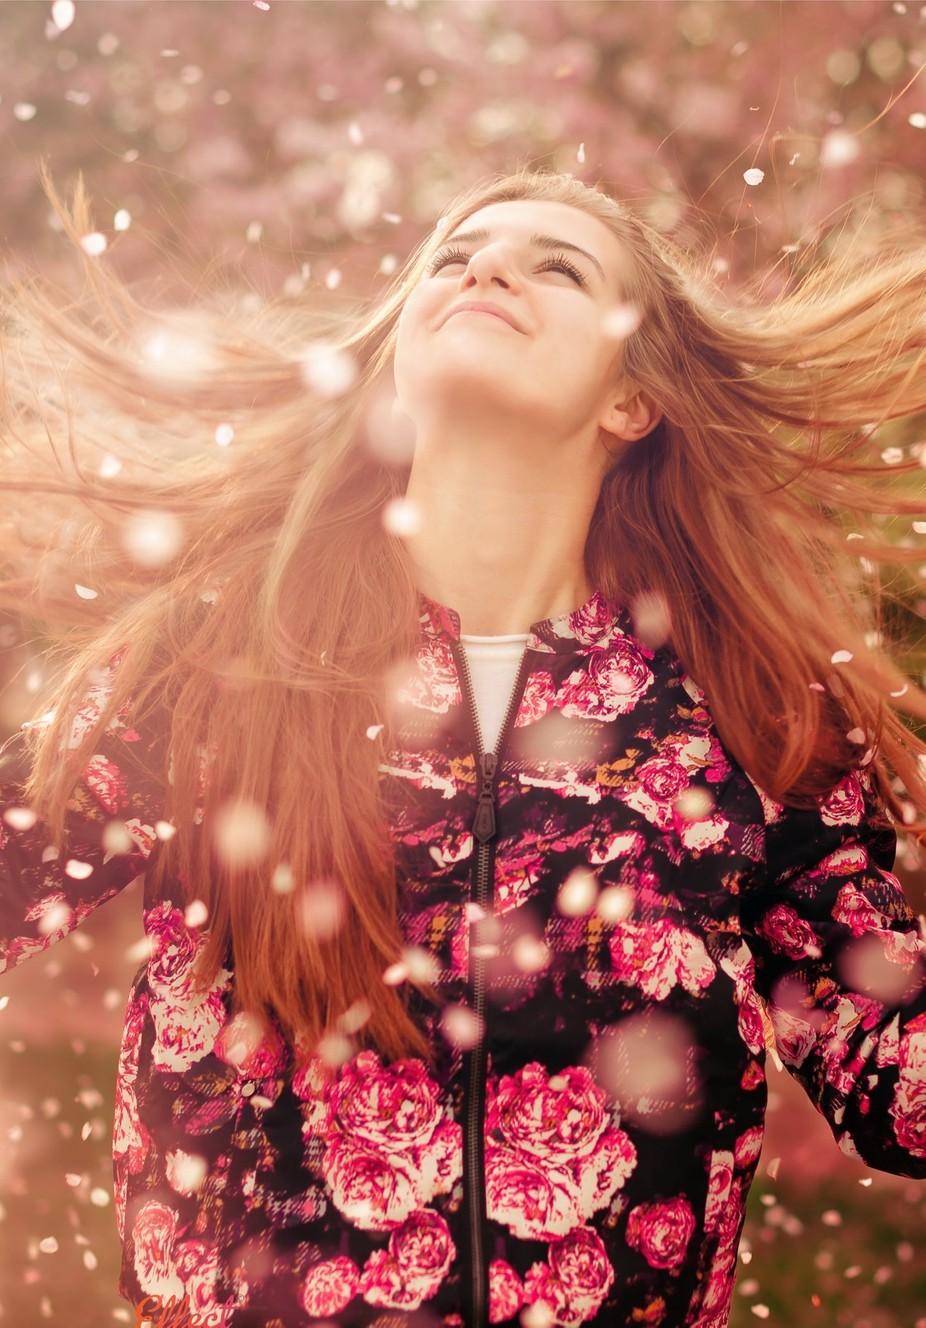 no worries  by eliondodaj - Pink Photo Contest